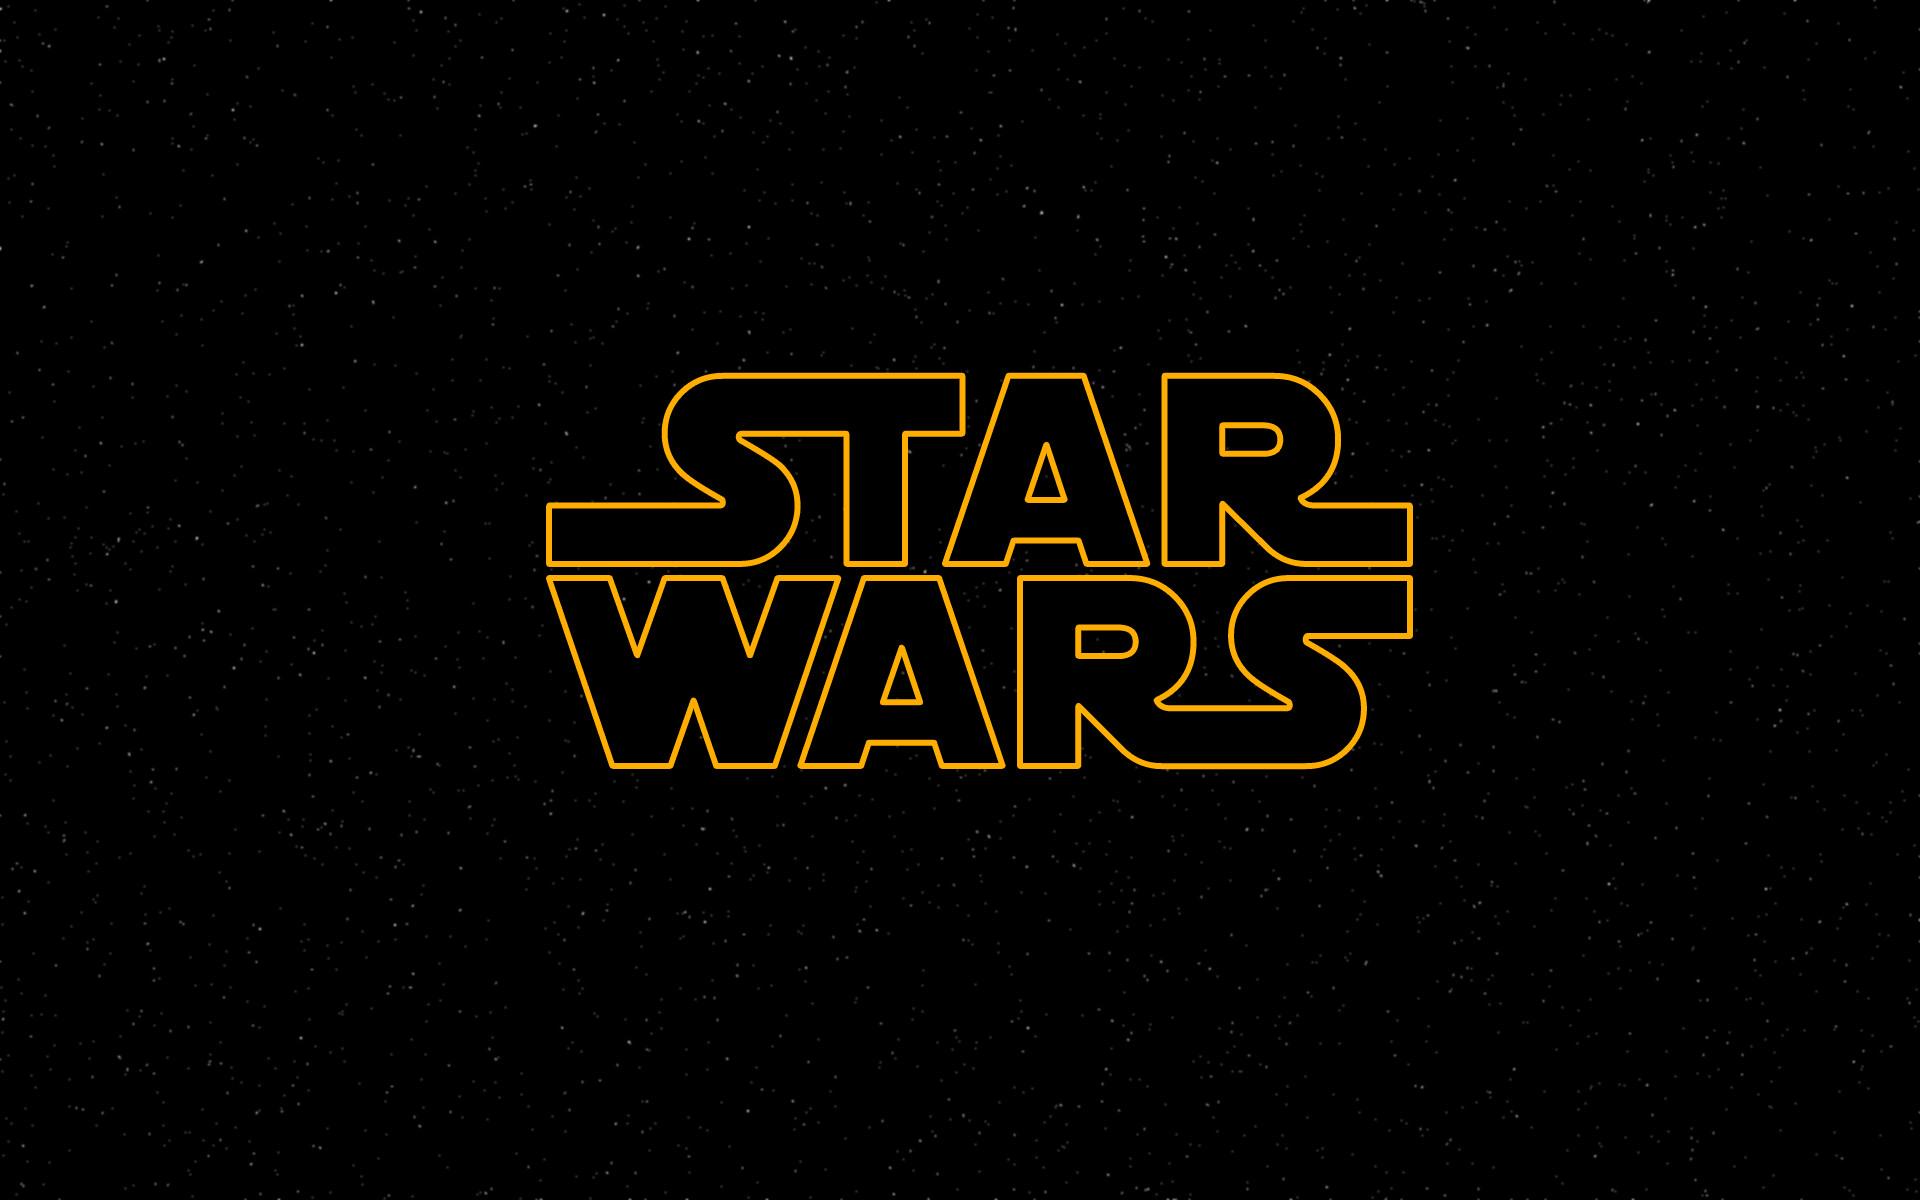 Star Wars Logo Wallpaper 28512 px